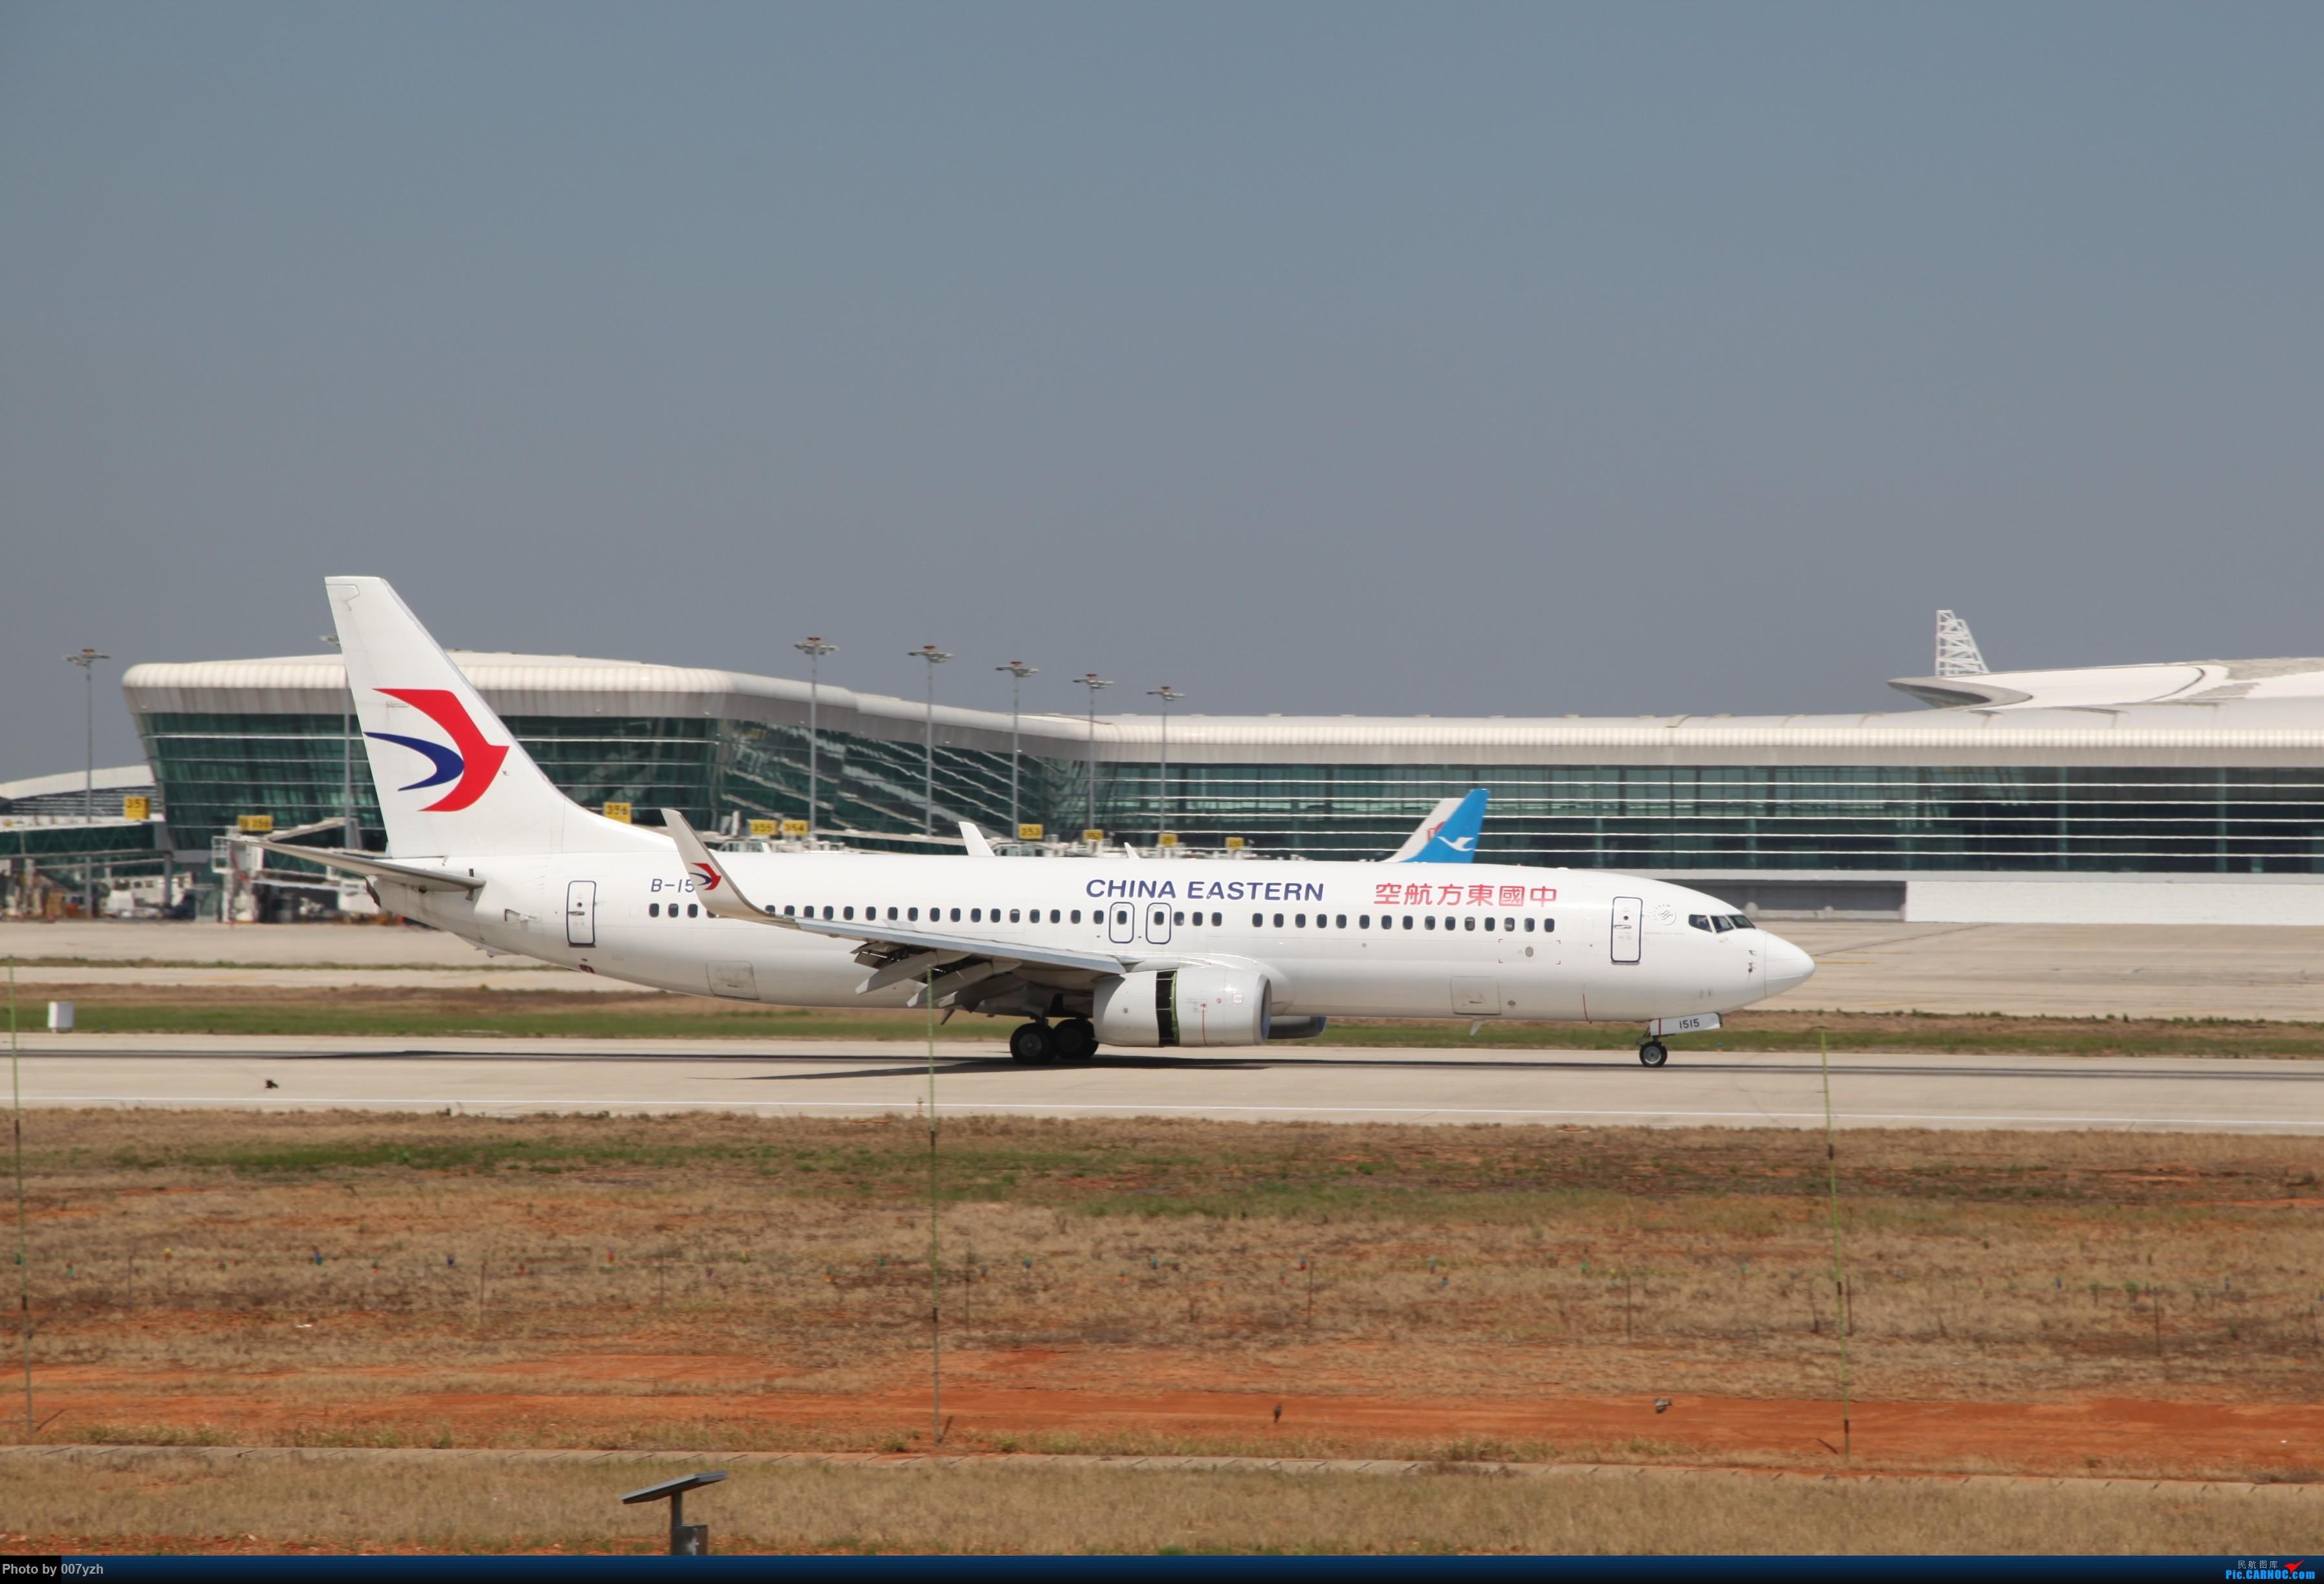 789re_re:奔着南航789来的武汉04r跑道拍机